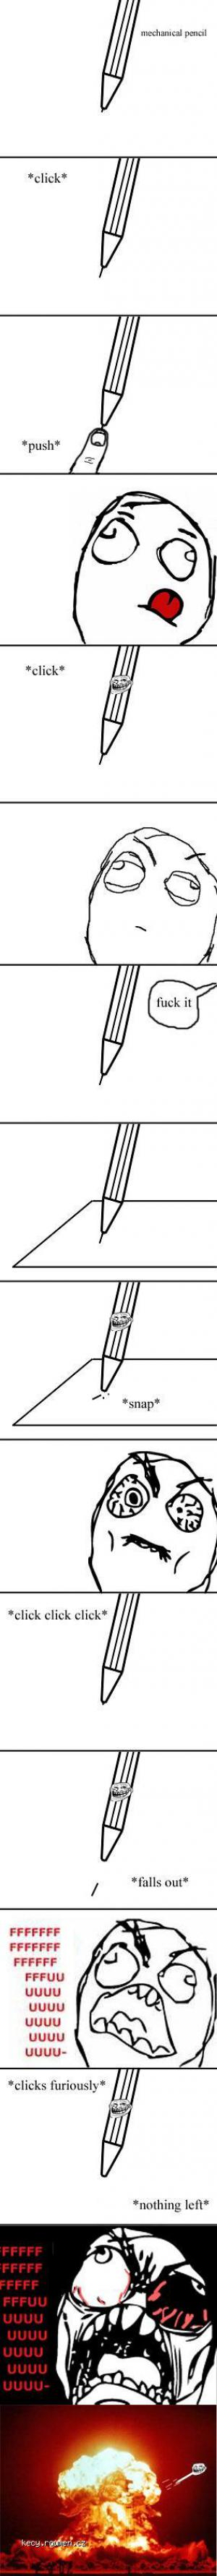 Mechanical pencil rage